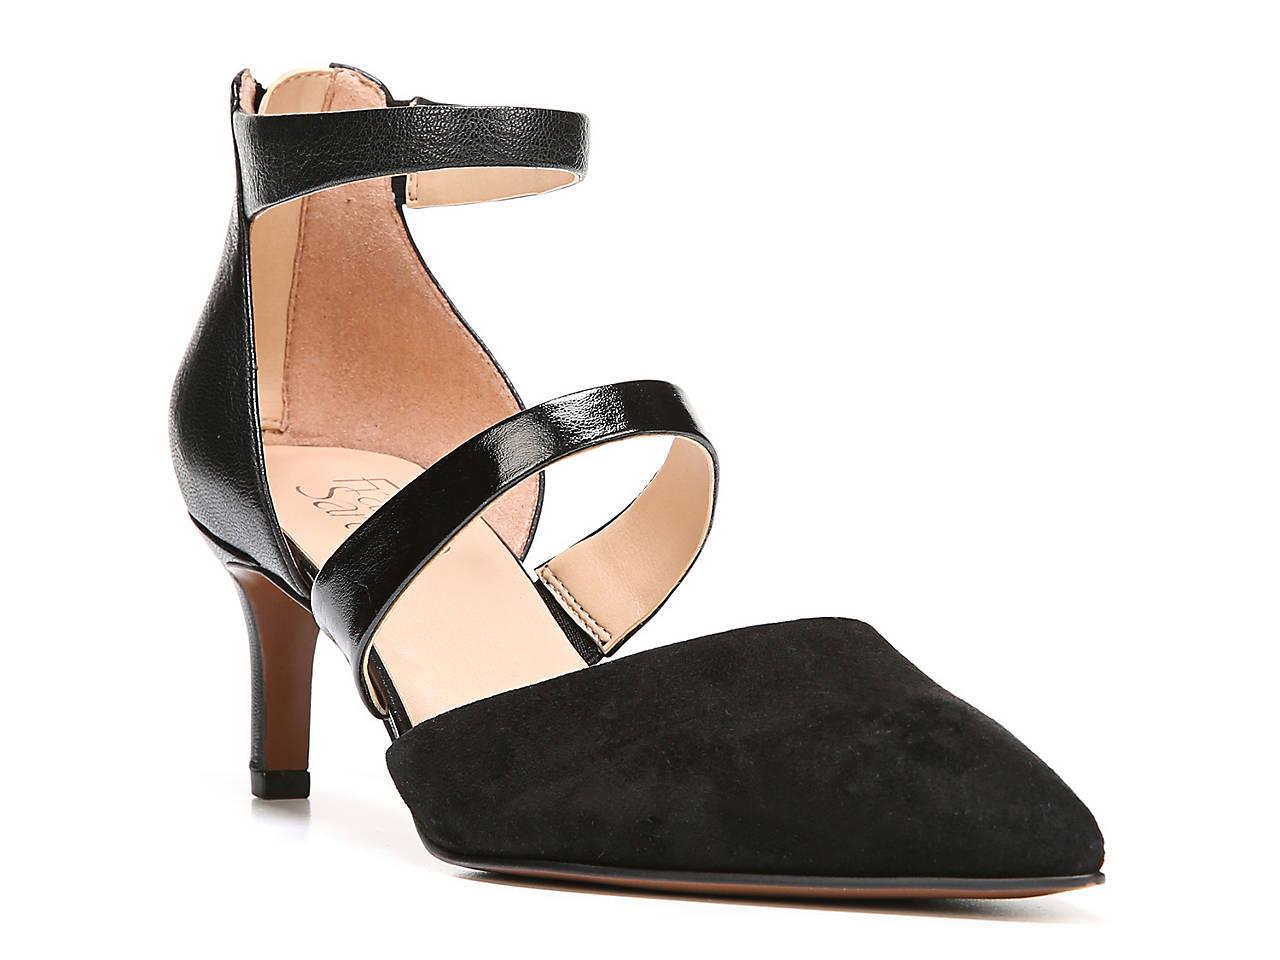 edcd18bd787 Franco Sarto Davey Pump Women s Shoes